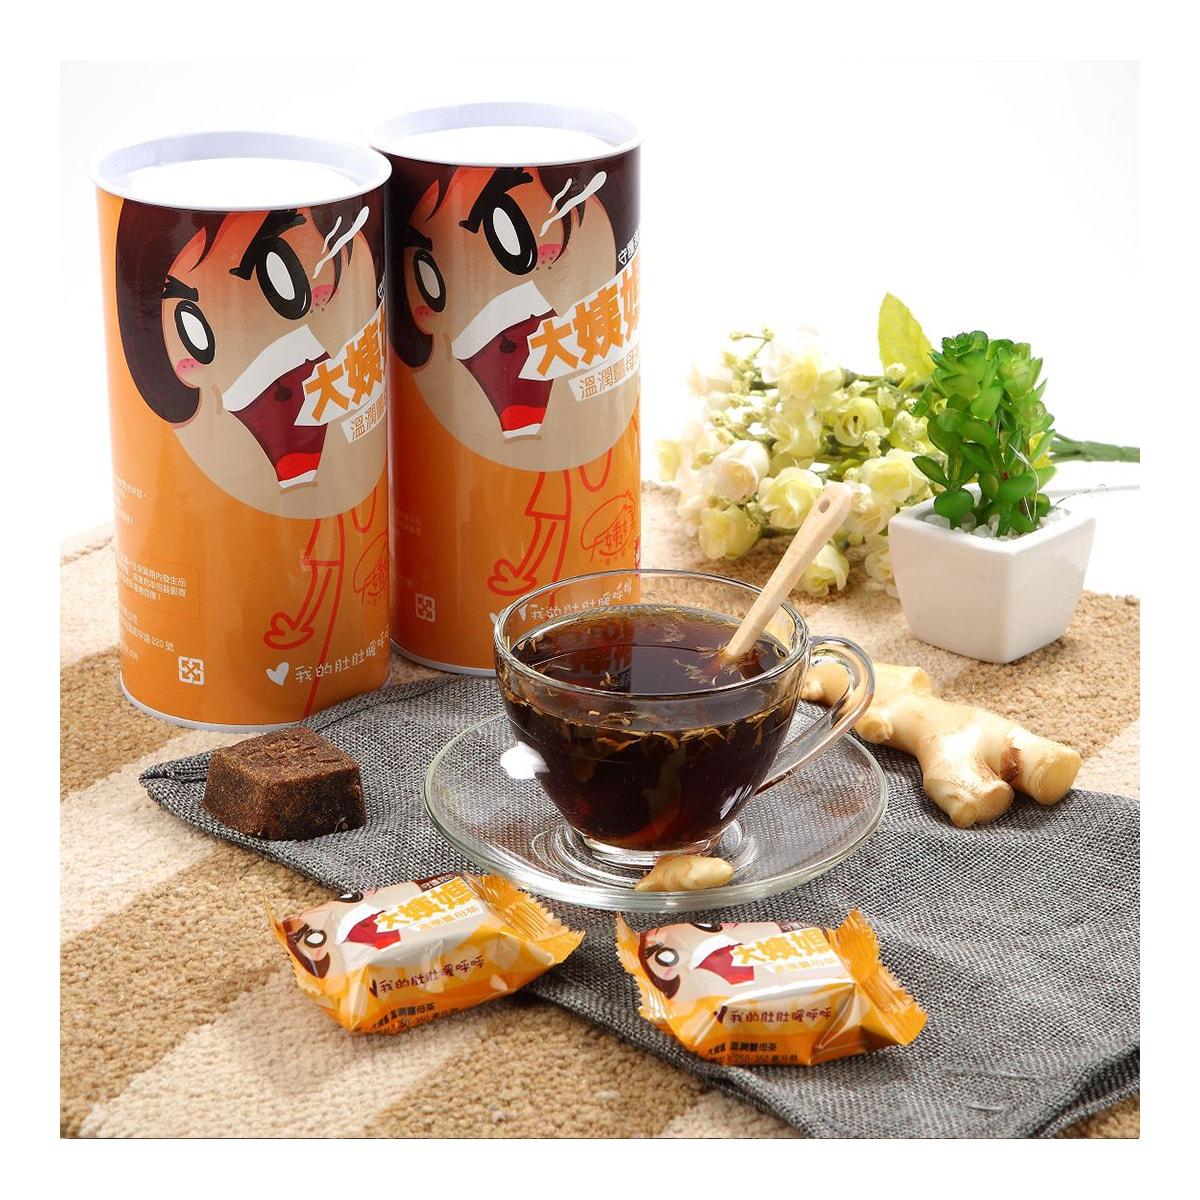 Dayimatea Black sugar ginger tea Healthy Tea For Periods